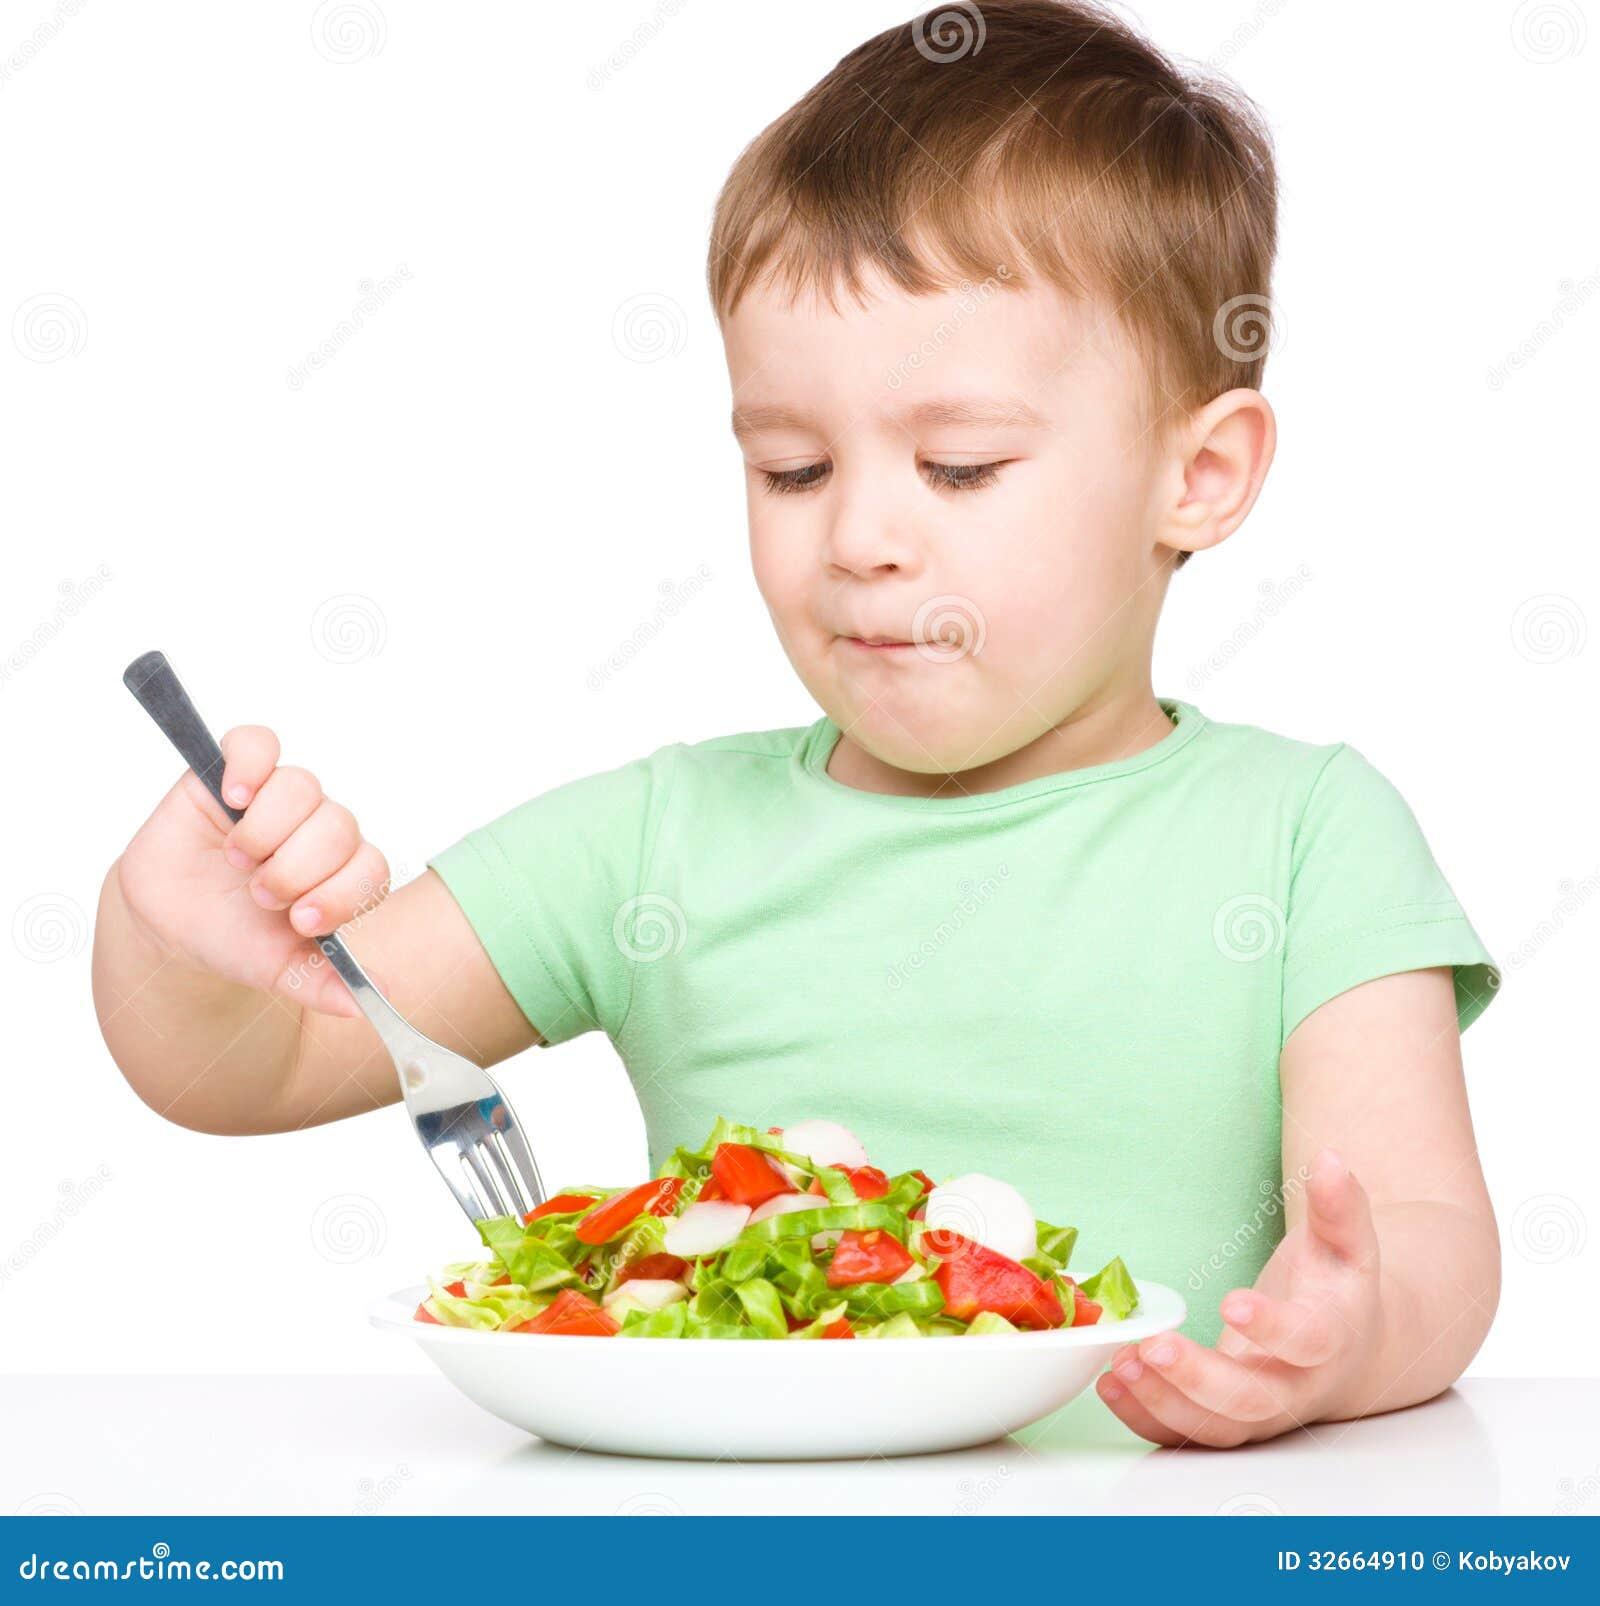 Baby Food Restaurant